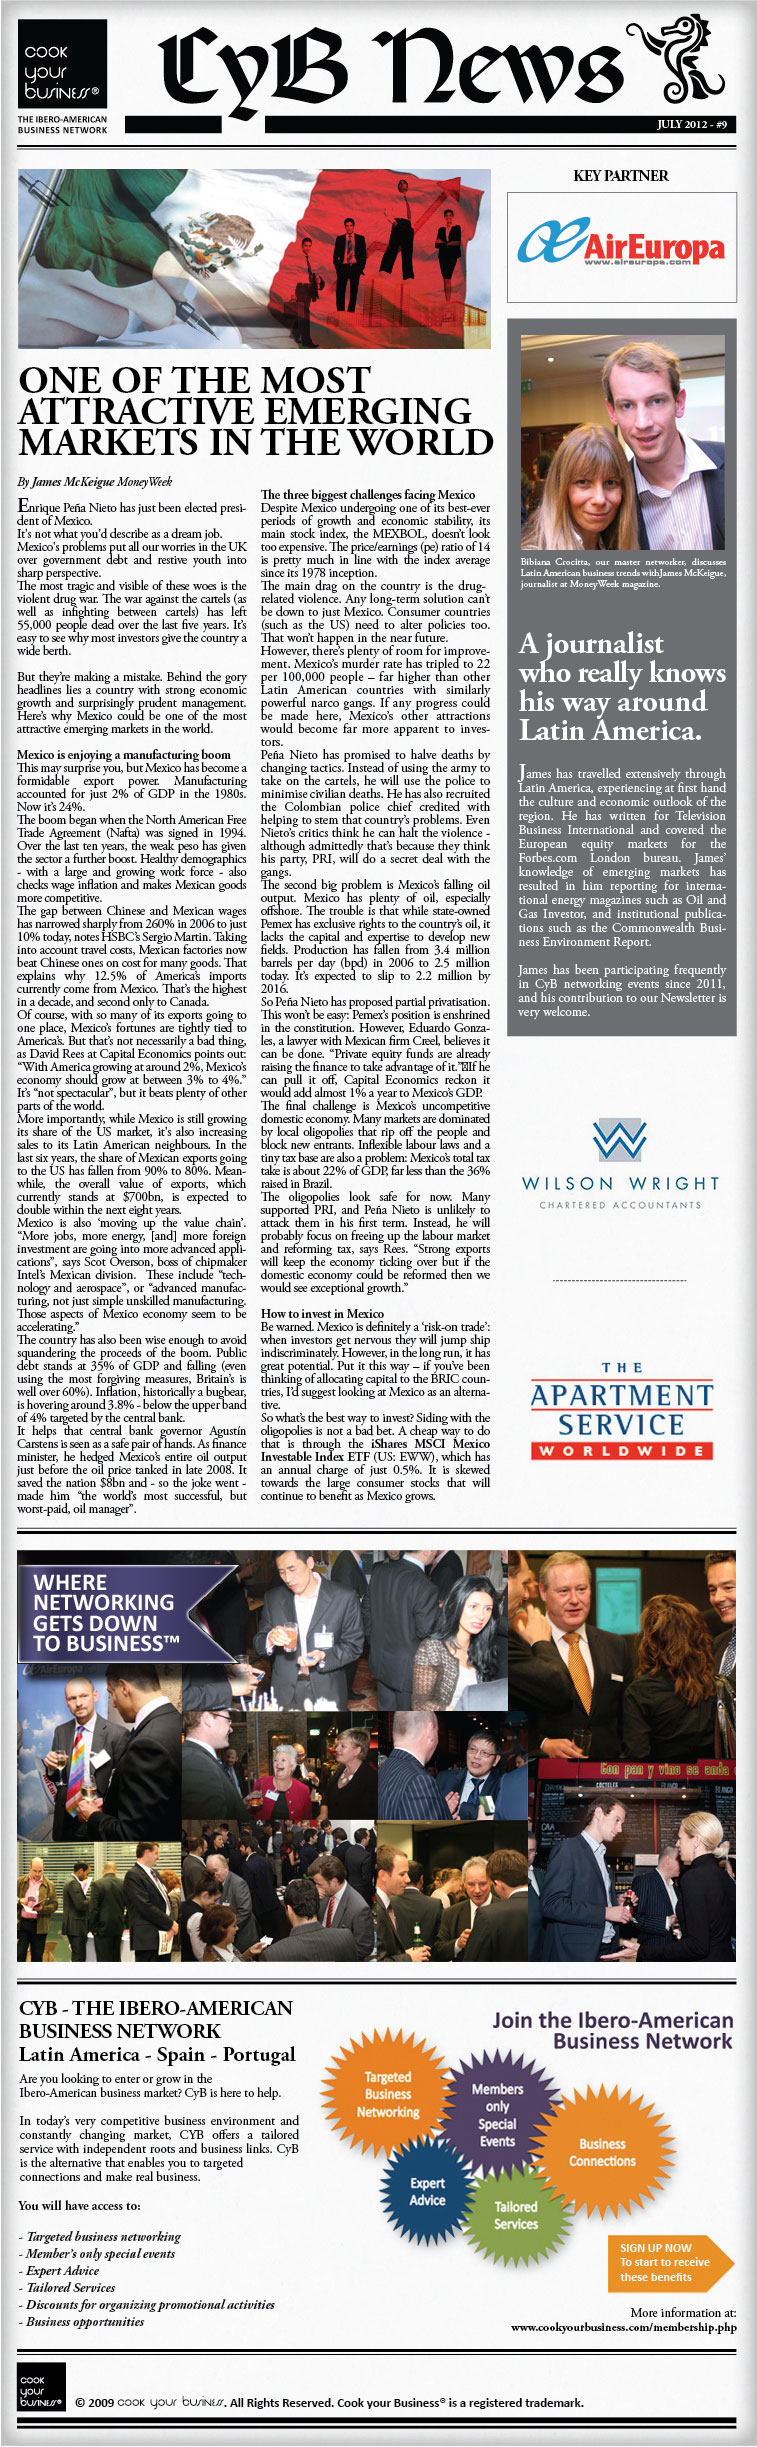 CyB News#8